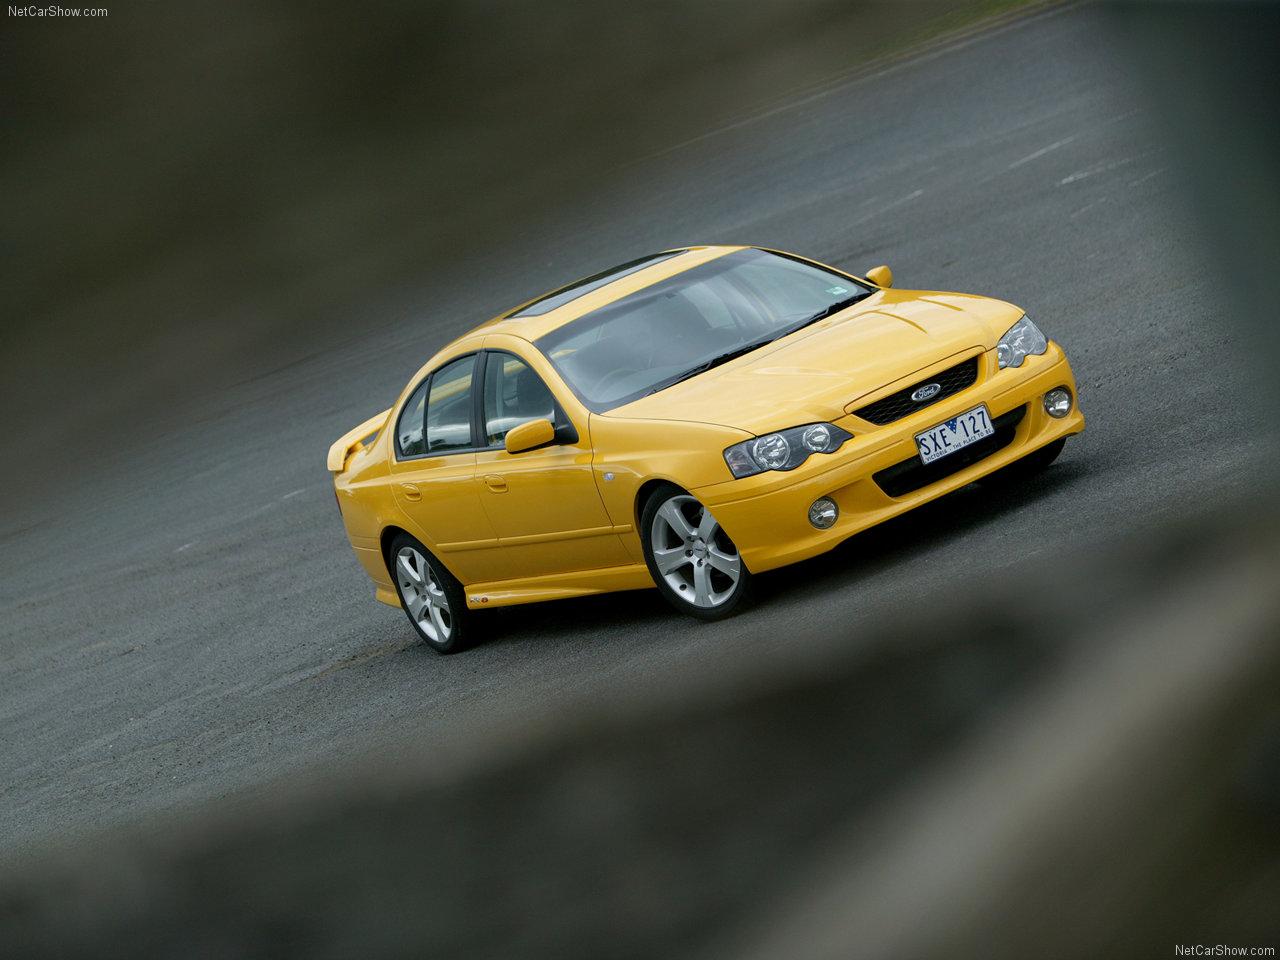 http://2.bp.blogspot.com/-WMTVEv5wO9k/TZ8RrmgGHeI/AAAAAAAAHQ4/C5SN_4i29ic/s1600/Ford-BA_MkII_Falcon_XR8_2004_1280x960_wallpaper_01.jpg